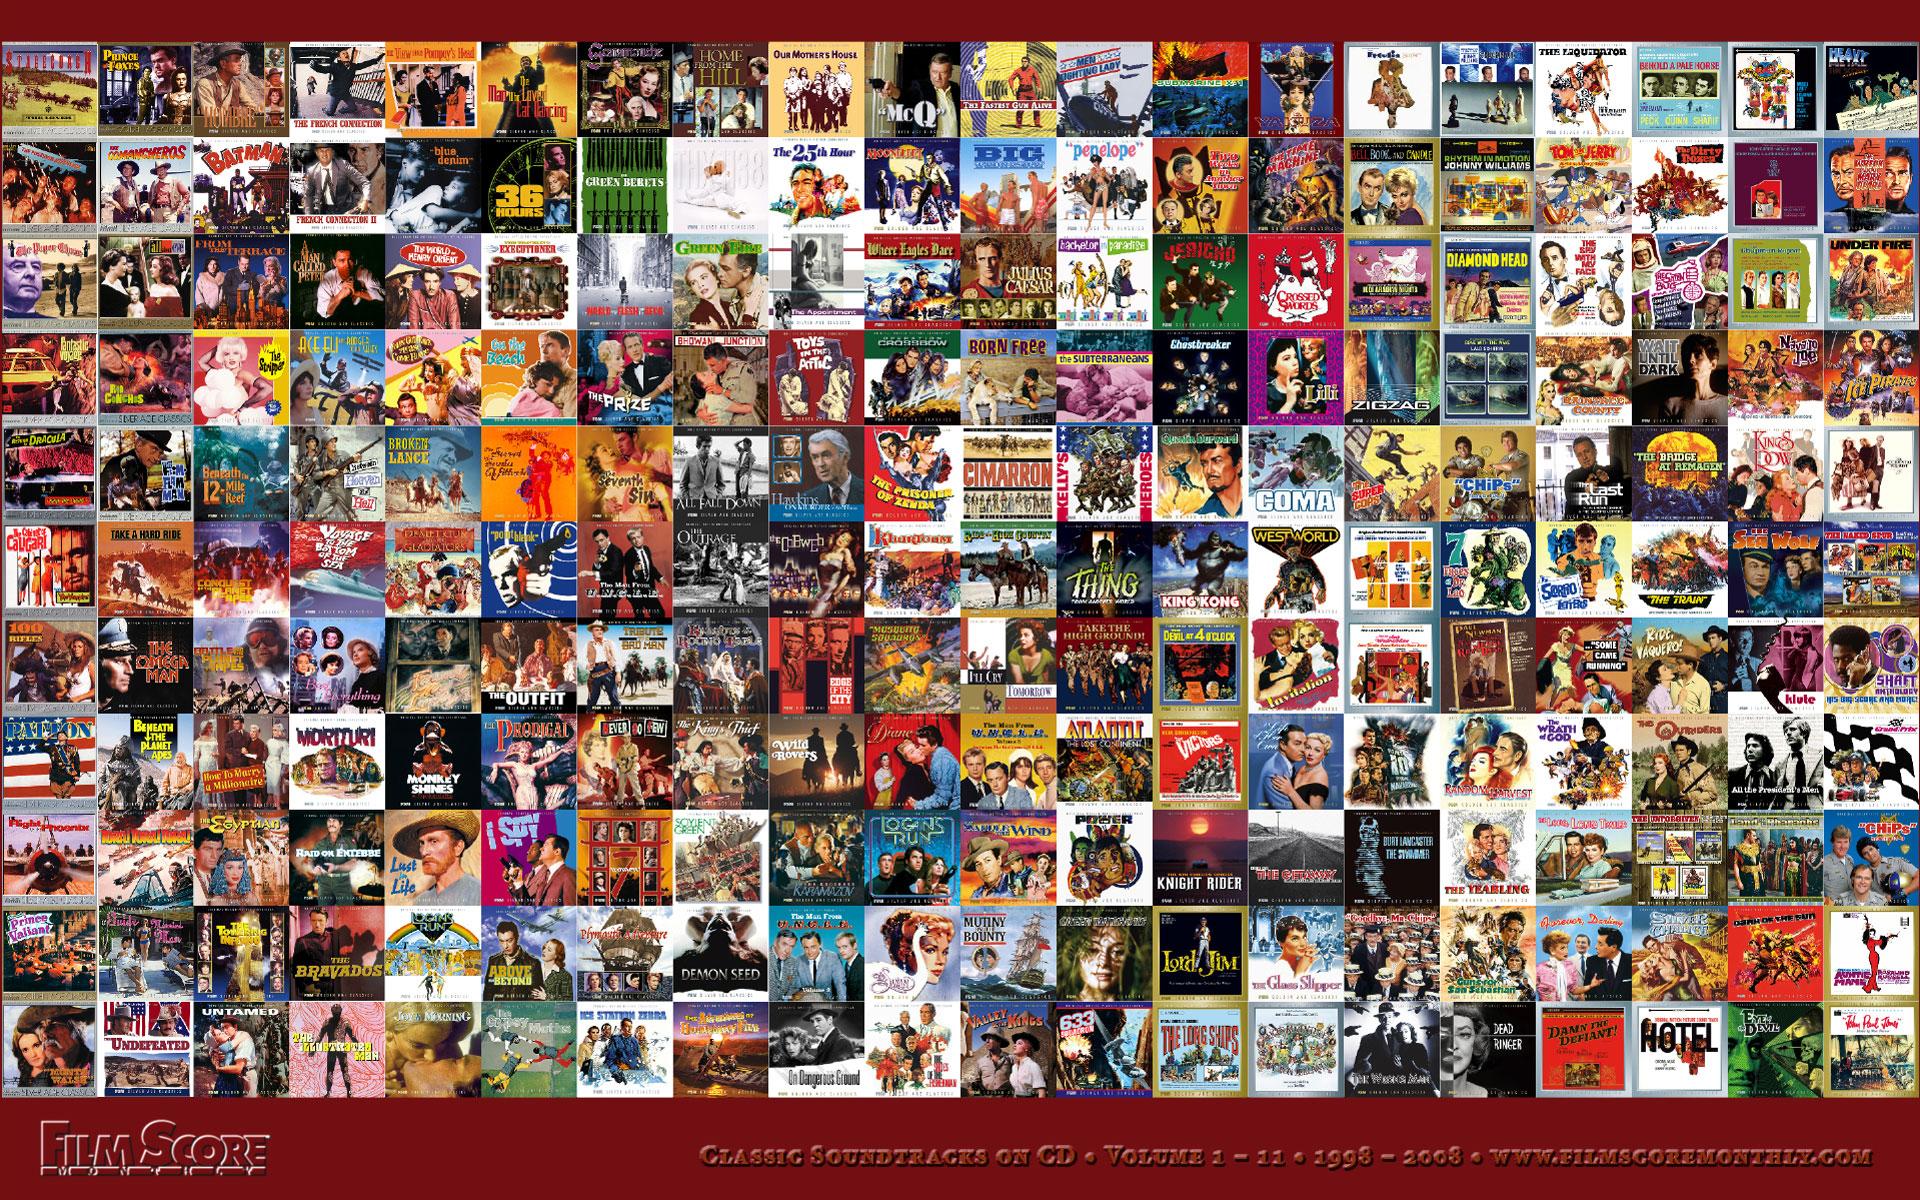 Fun Fall Desktop Wallpaper Film Score Monthly Desktop Wallpaper